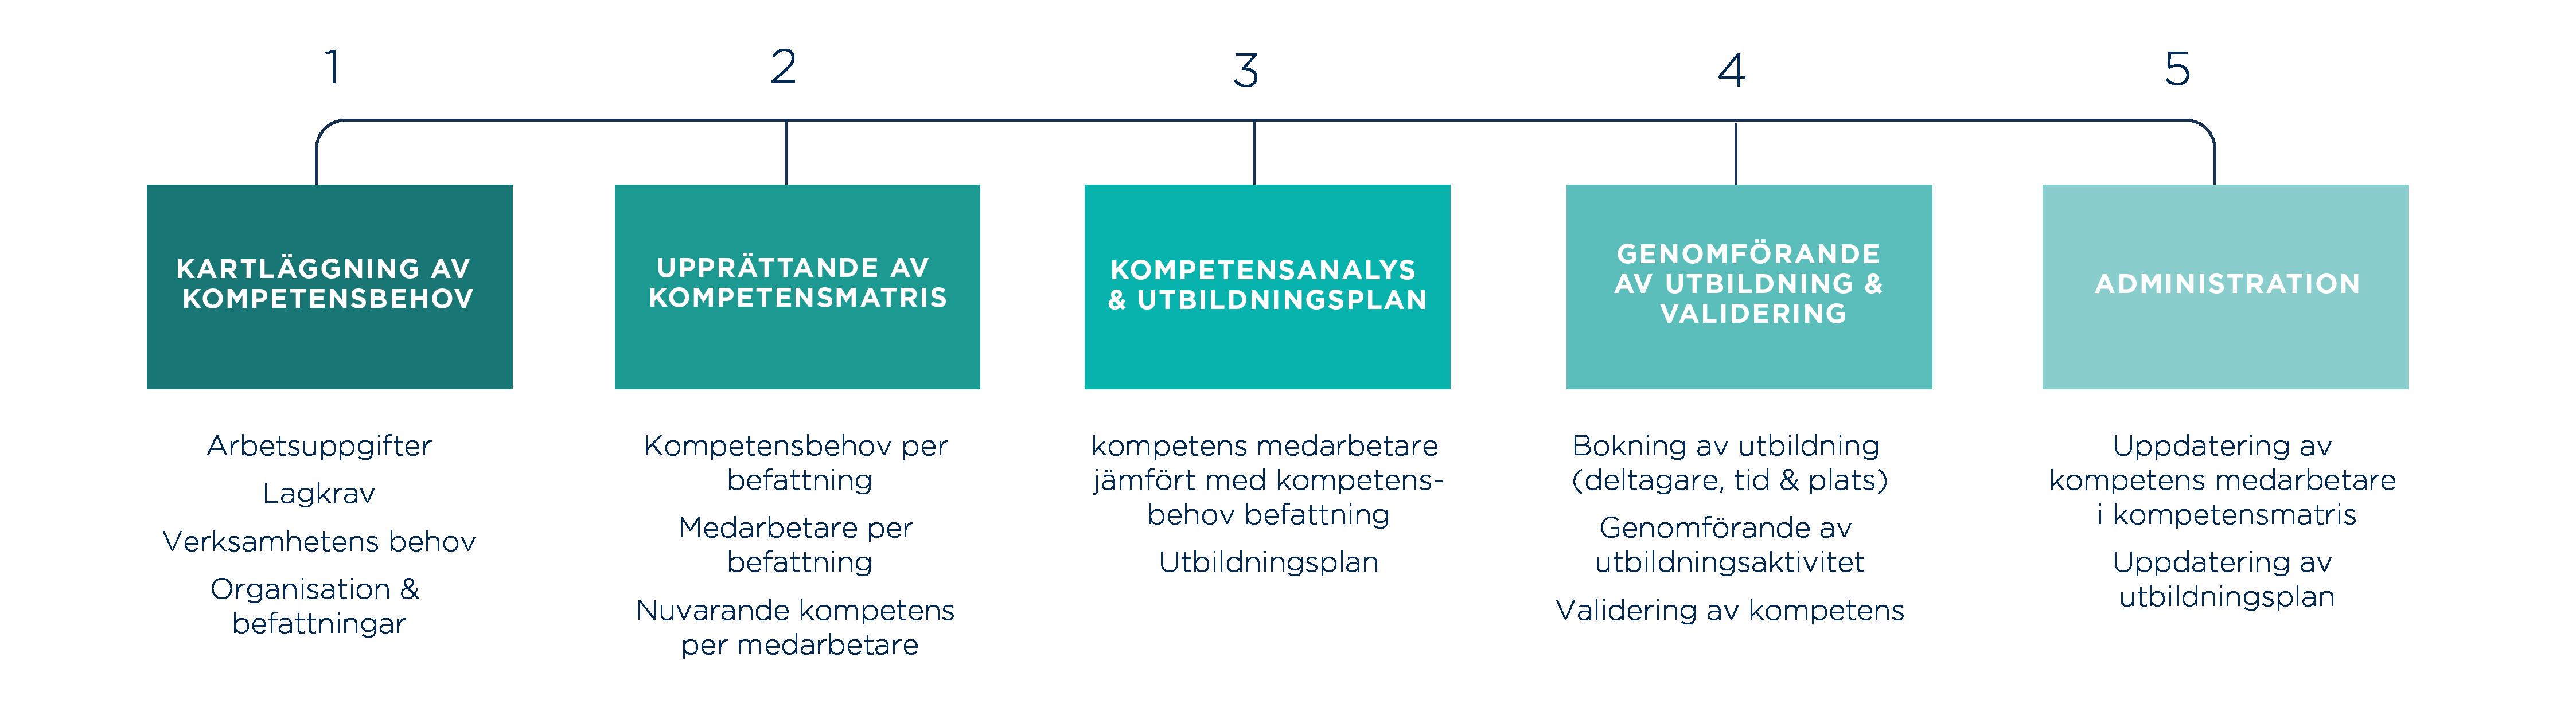 kompetenscoach fem steg